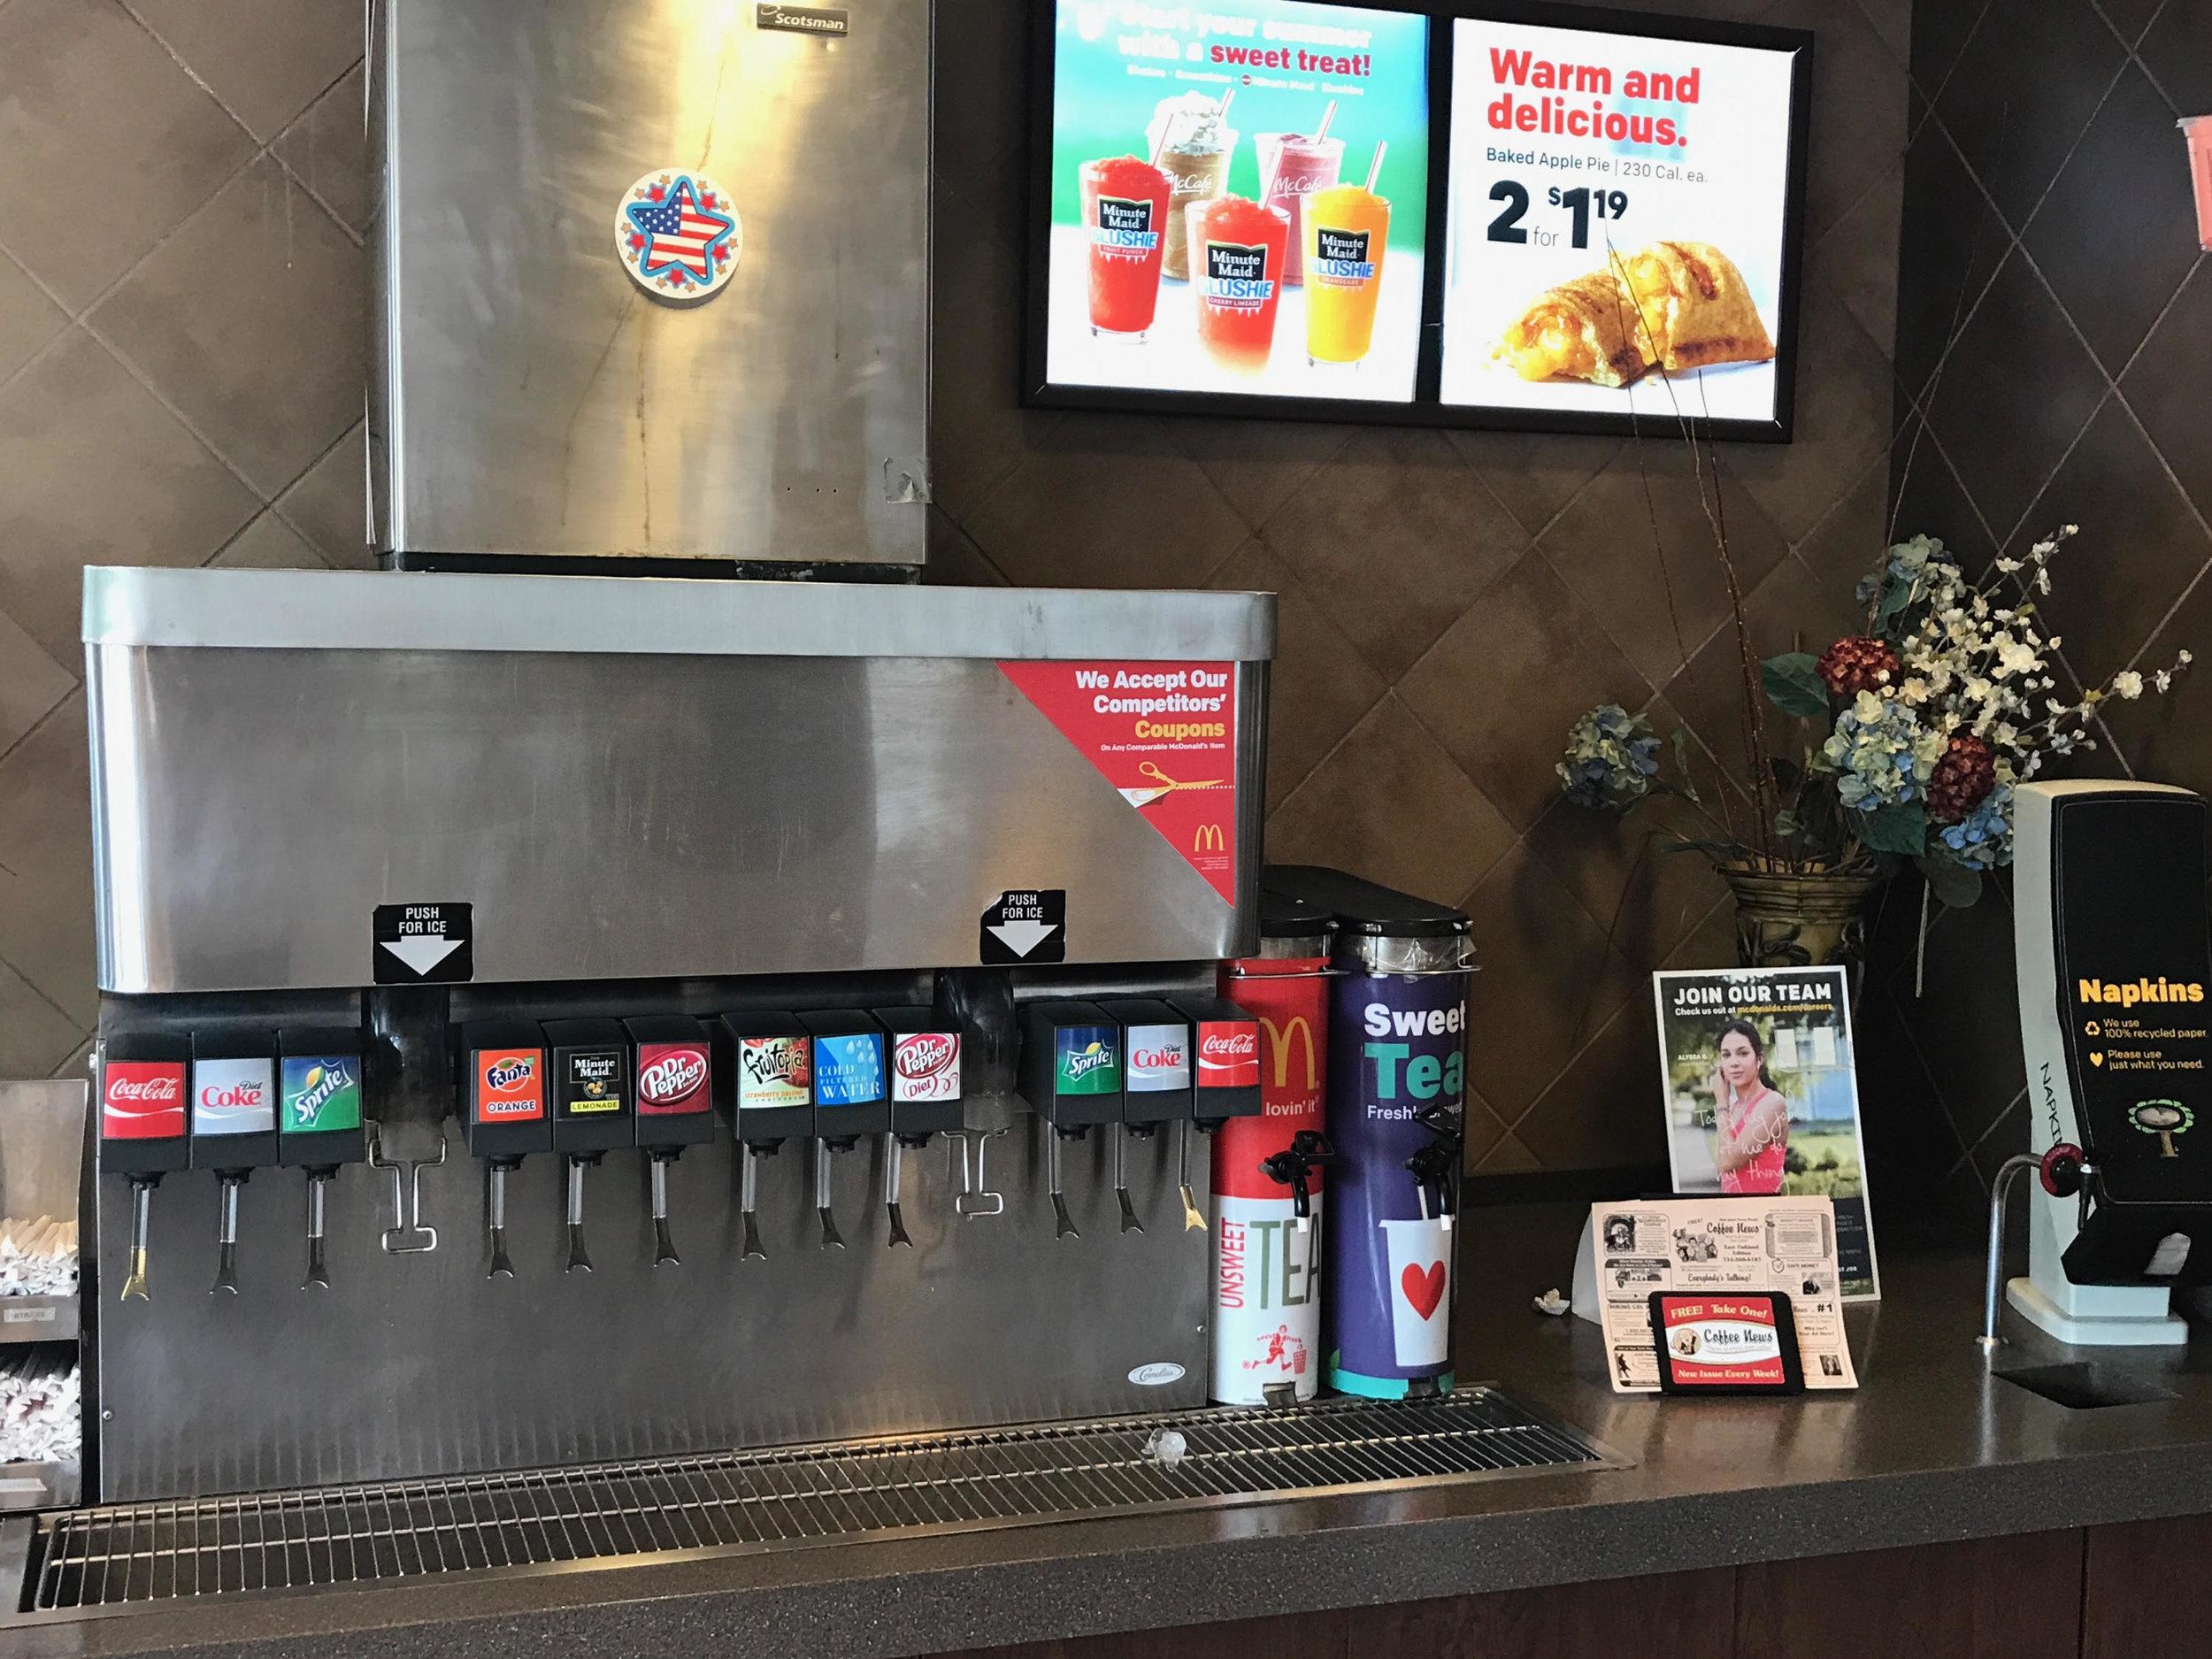 McDonalds-Pontiac Trail & Beck-August 2018.jpg